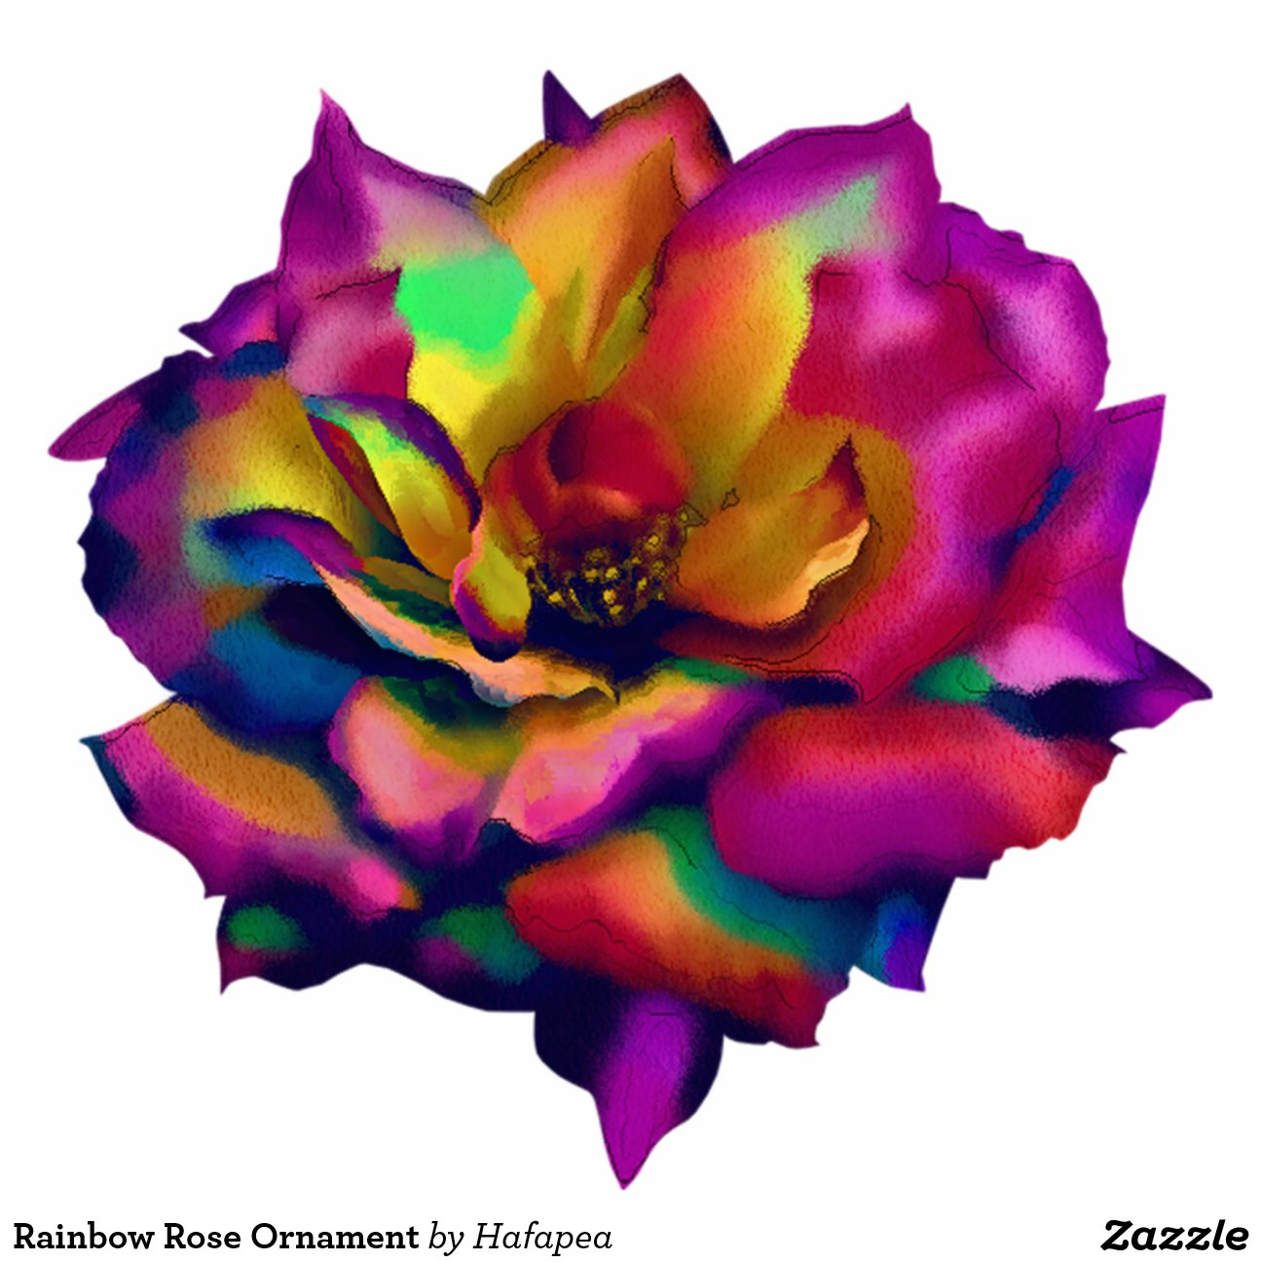 regenbogen rosen verzierung fotoskulptur ornament zazzle. Black Bedroom Furniture Sets. Home Design Ideas